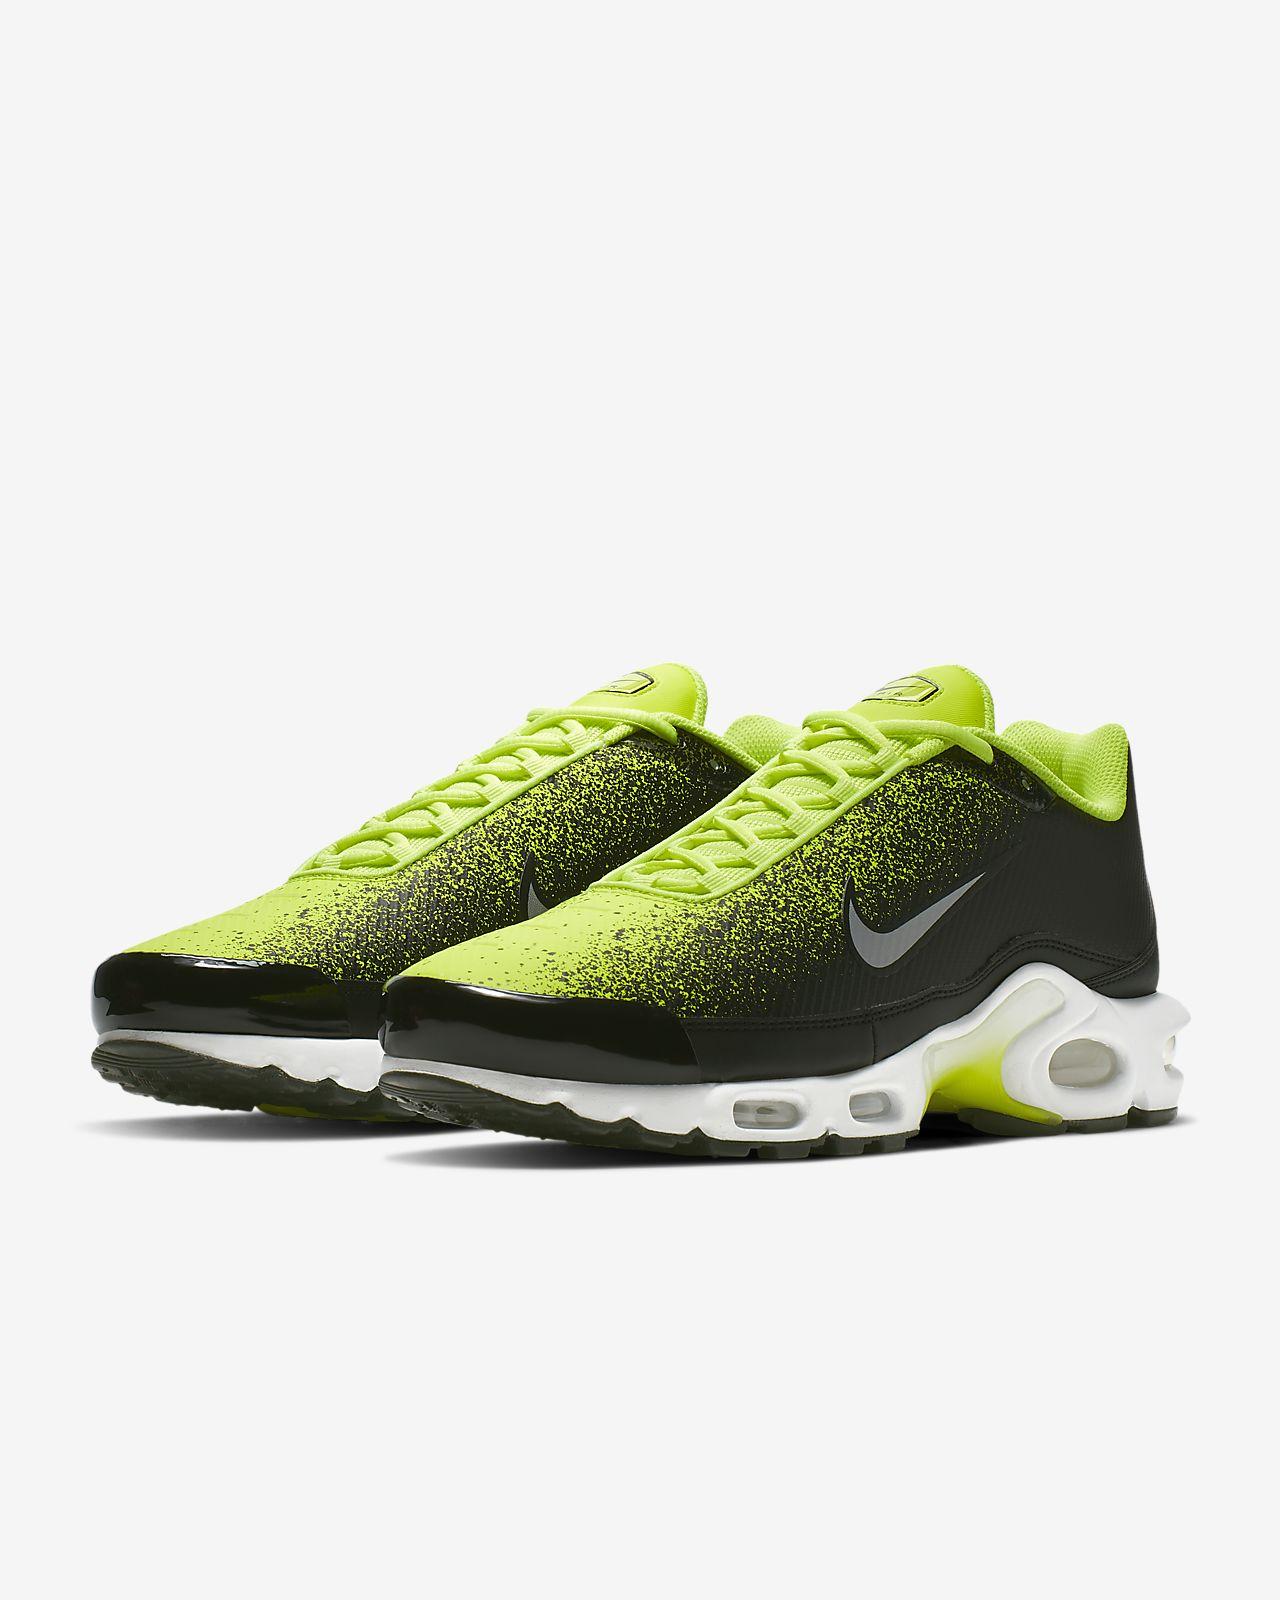 Calzado para hombre Nike Air Max Plus Tn SE